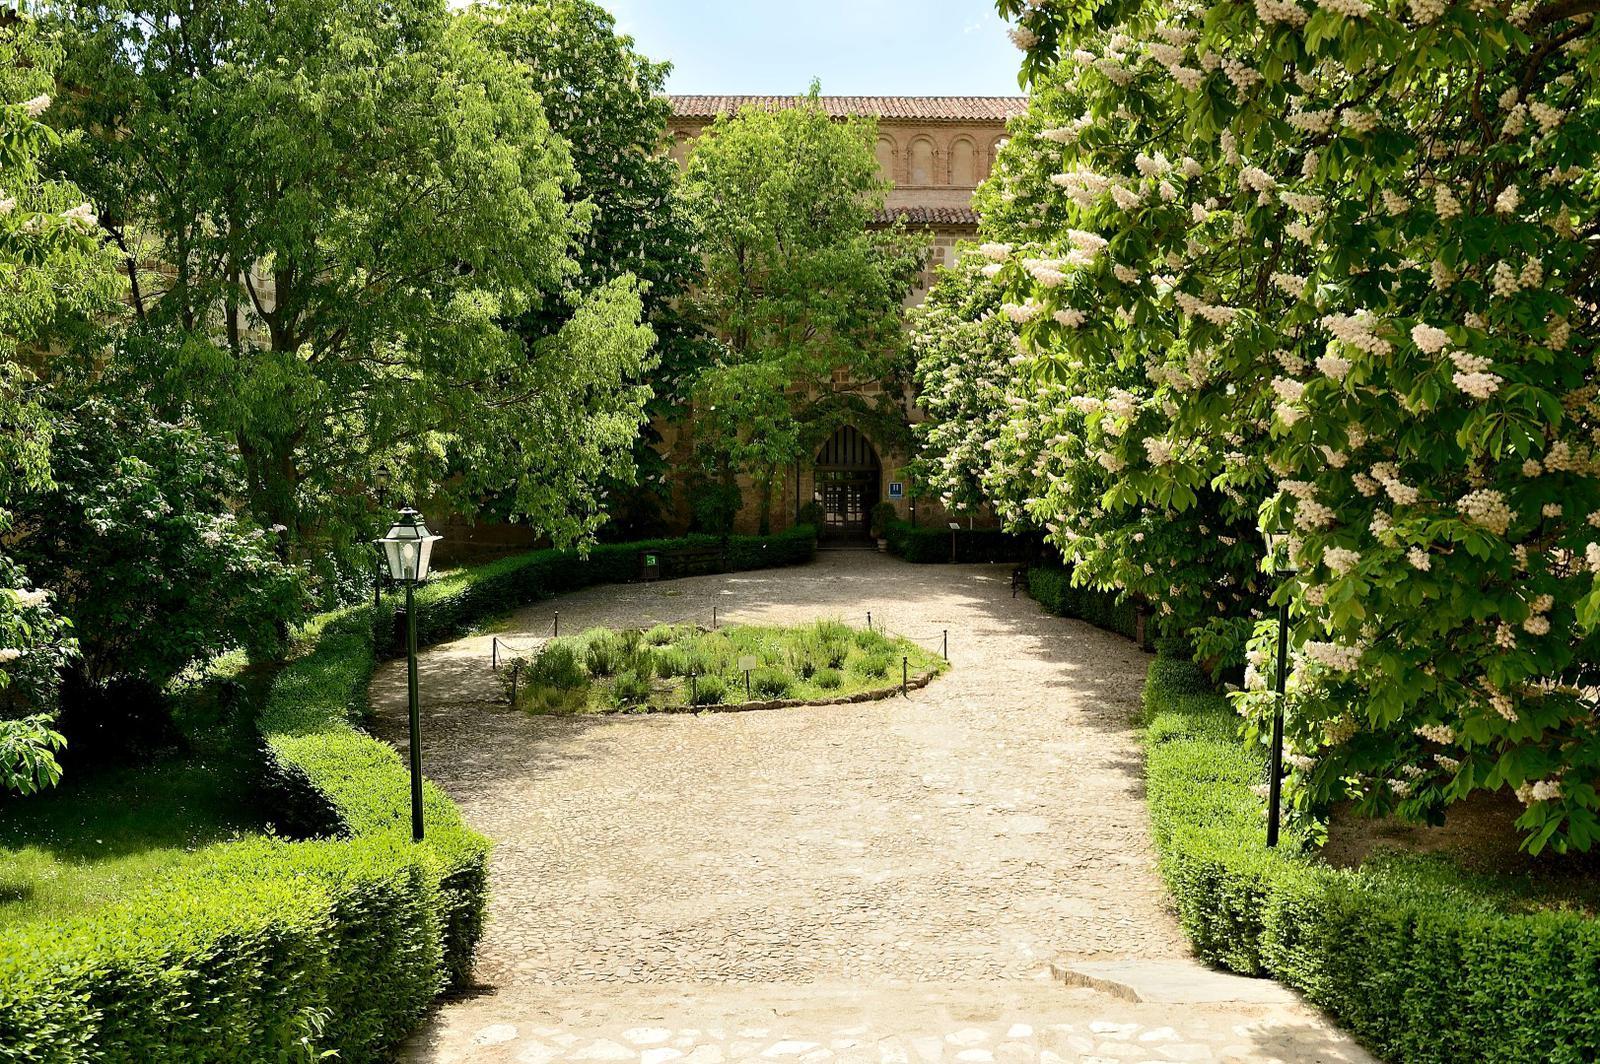 Monasterio de Piedra - Garden (Large)